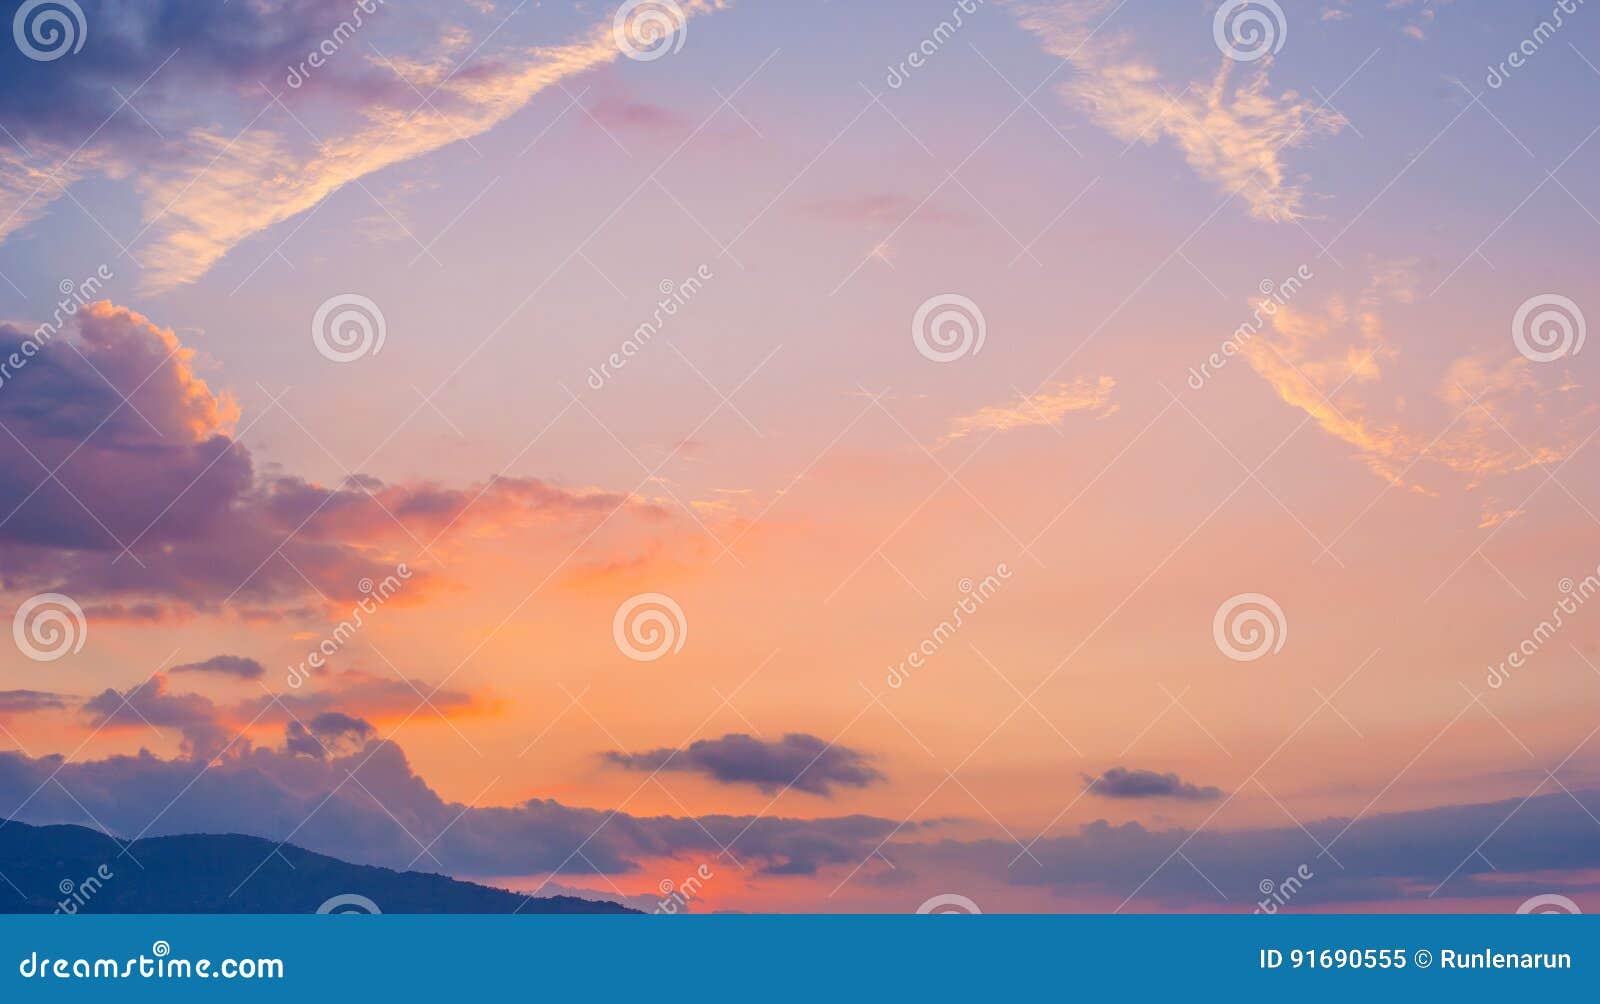 Mooie zonsonderganghemel met wolken, bergmening